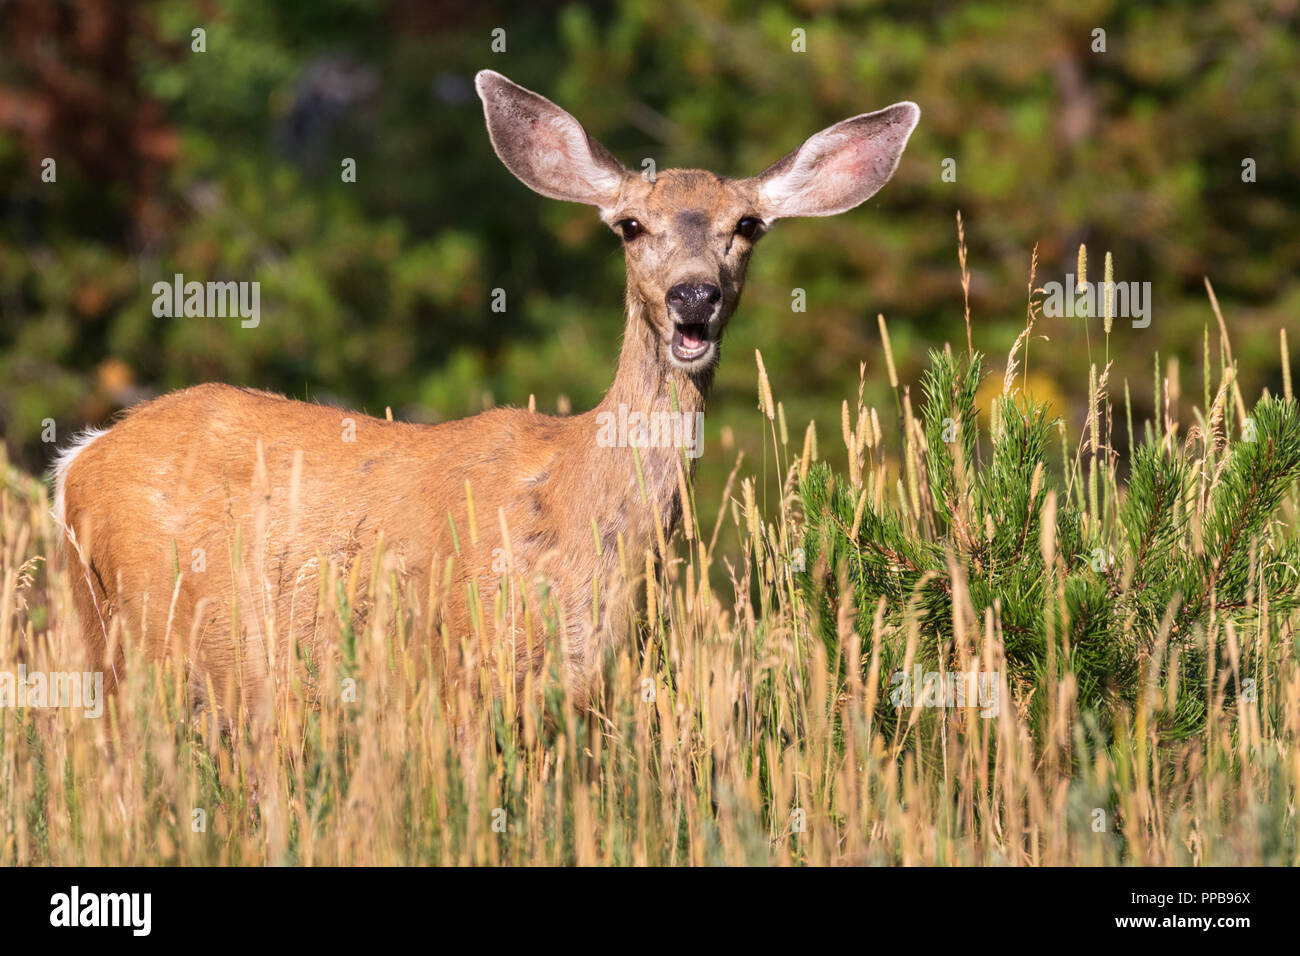 Mule deer (Odocoileus hemionus) - Stock Image